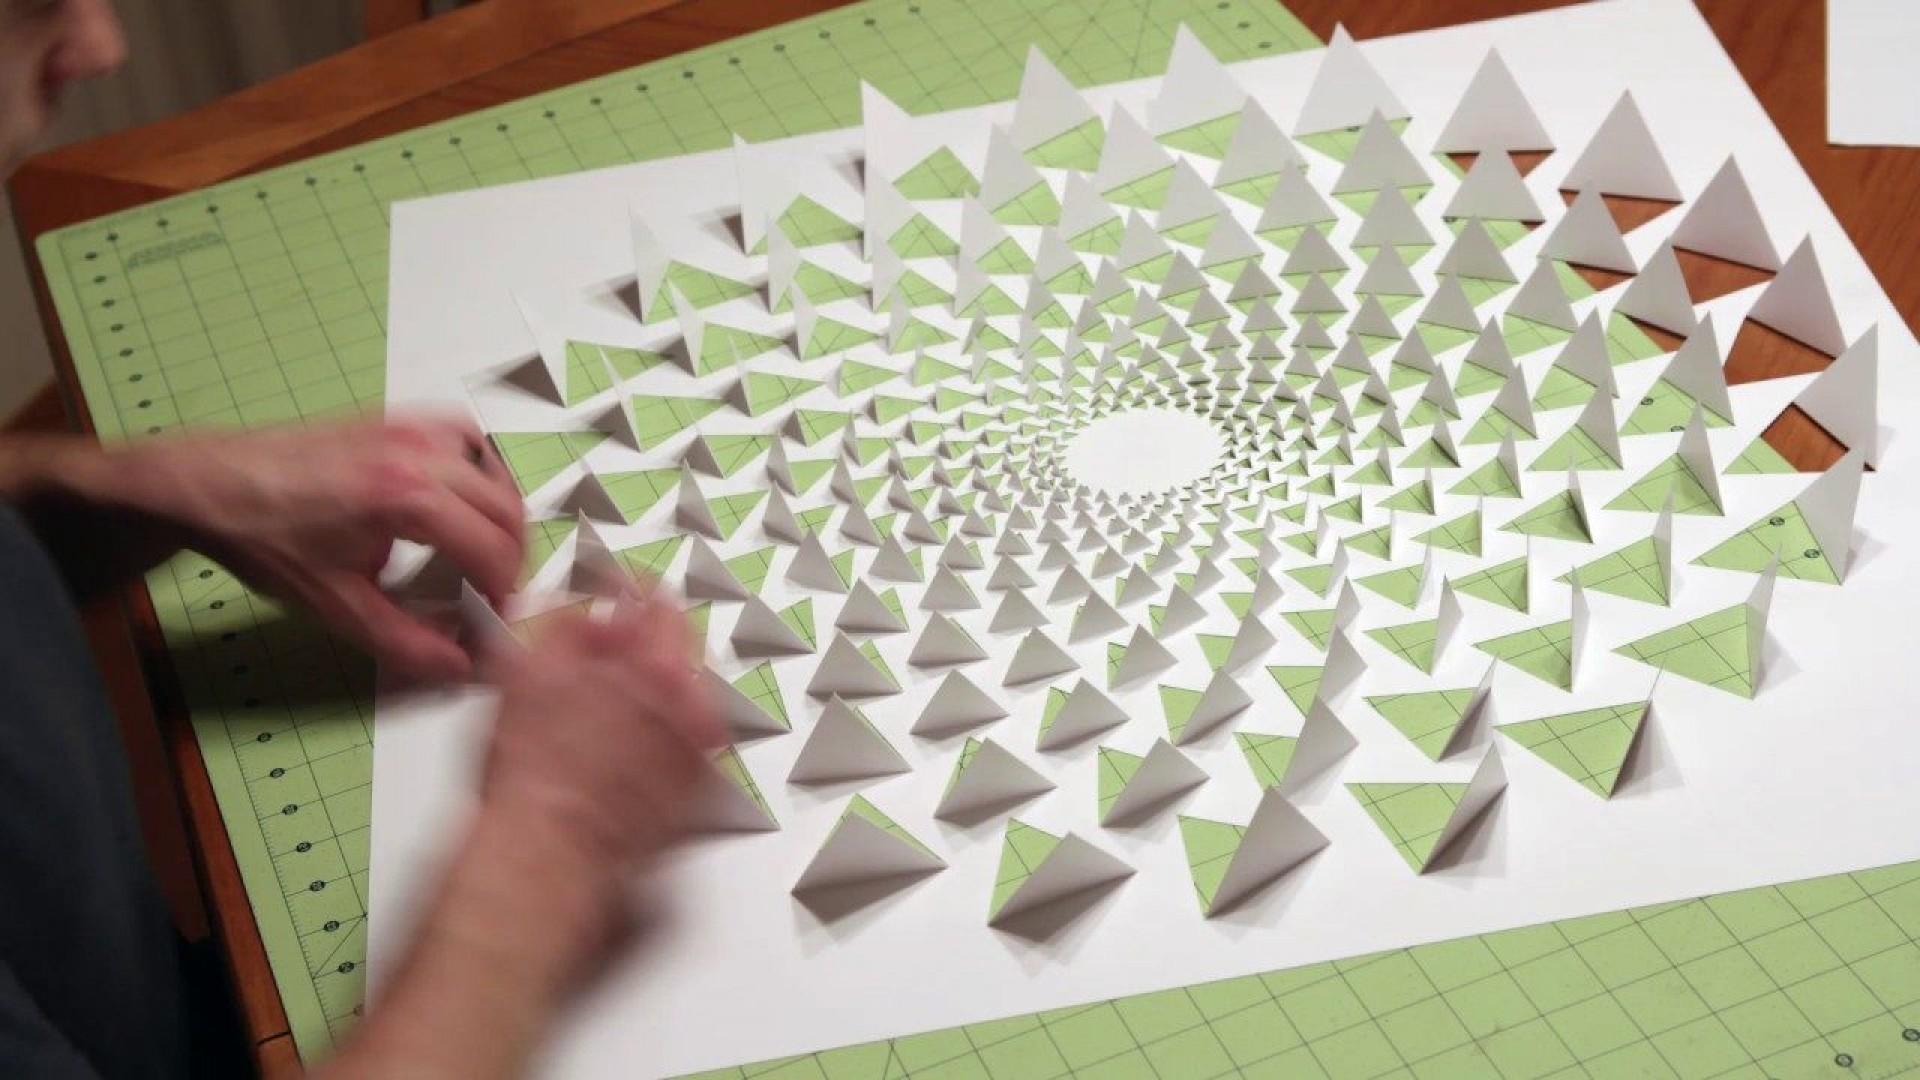 006 Fascinating 3d Paper Art Template Image  Templates Pdf1920